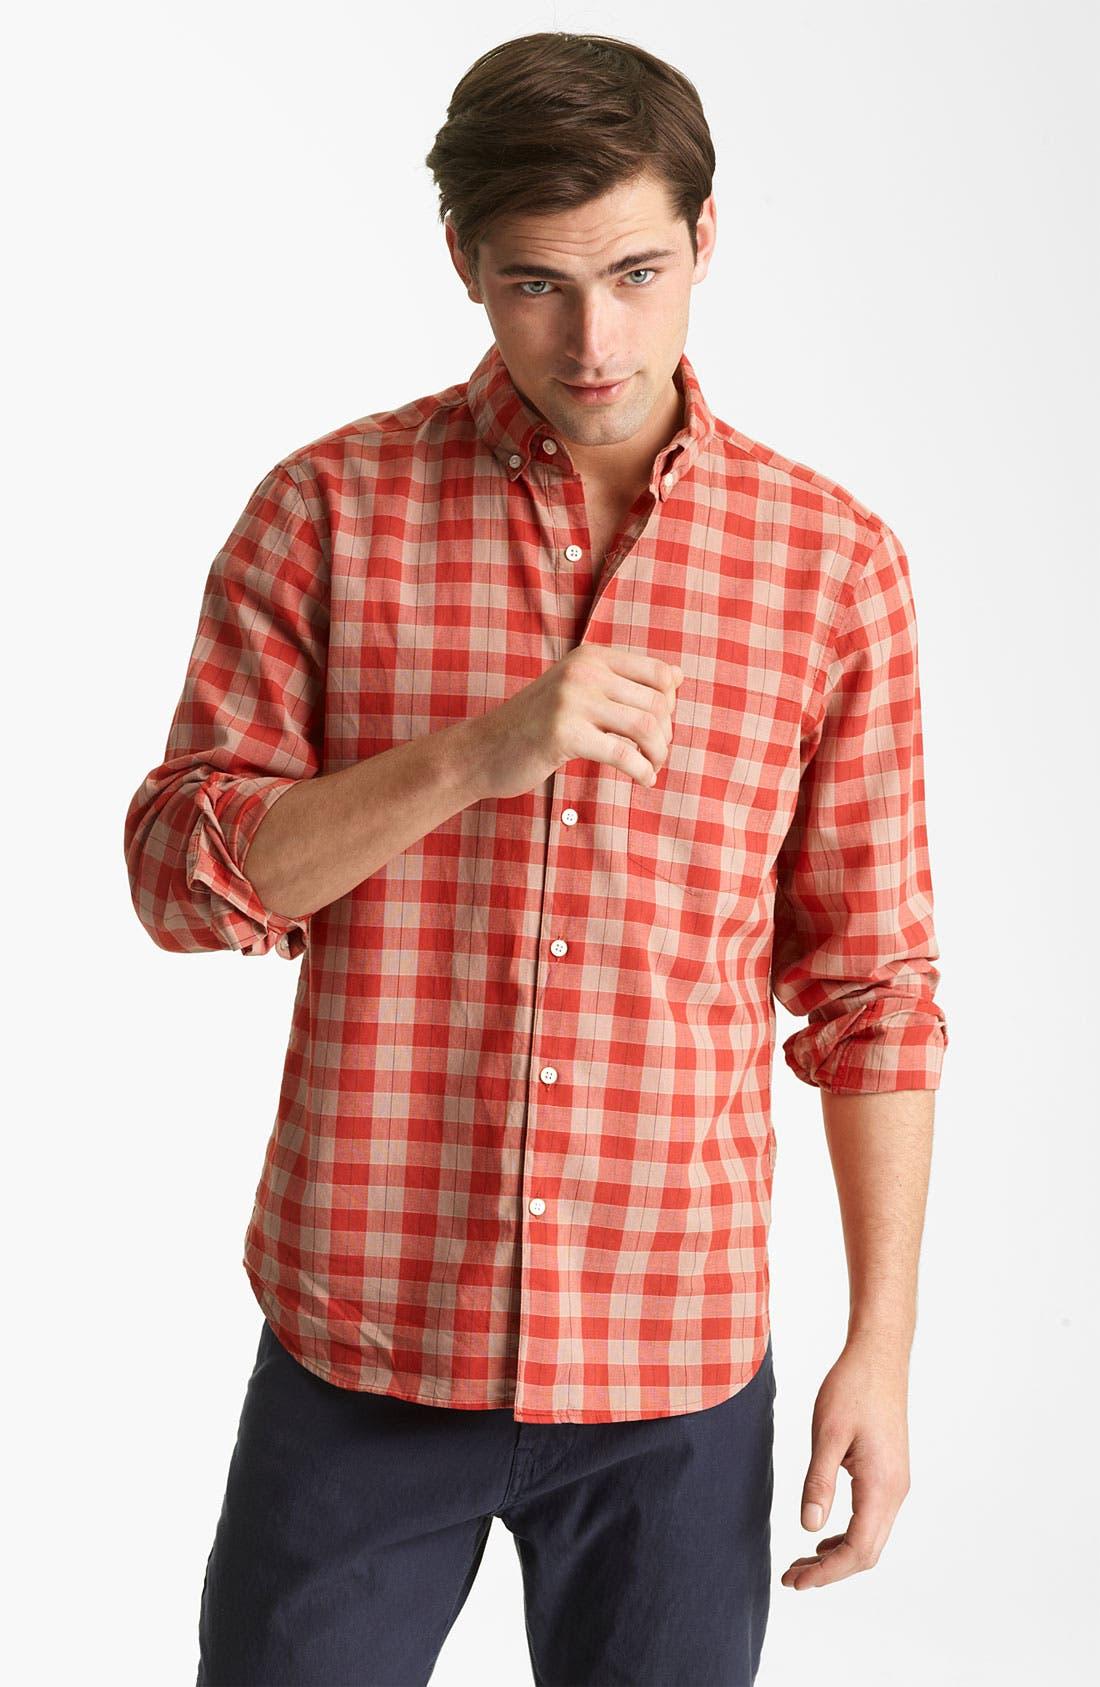 Alternate Image 1 Selected - Steven Alan Plaid Sport Shirt